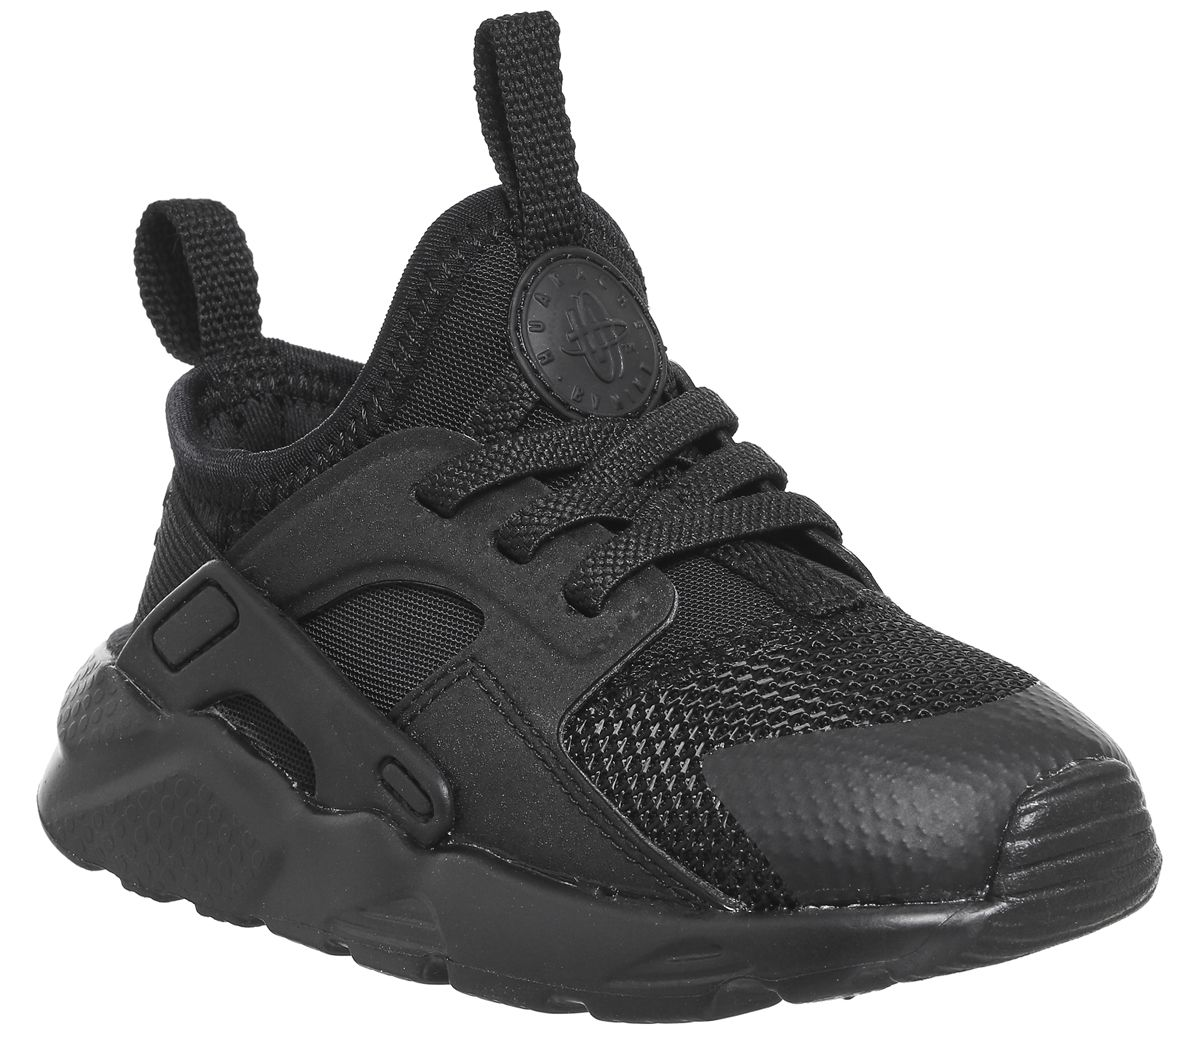 070c0d38dabe Nike Huarache Run Ultra Td Black - Unisex